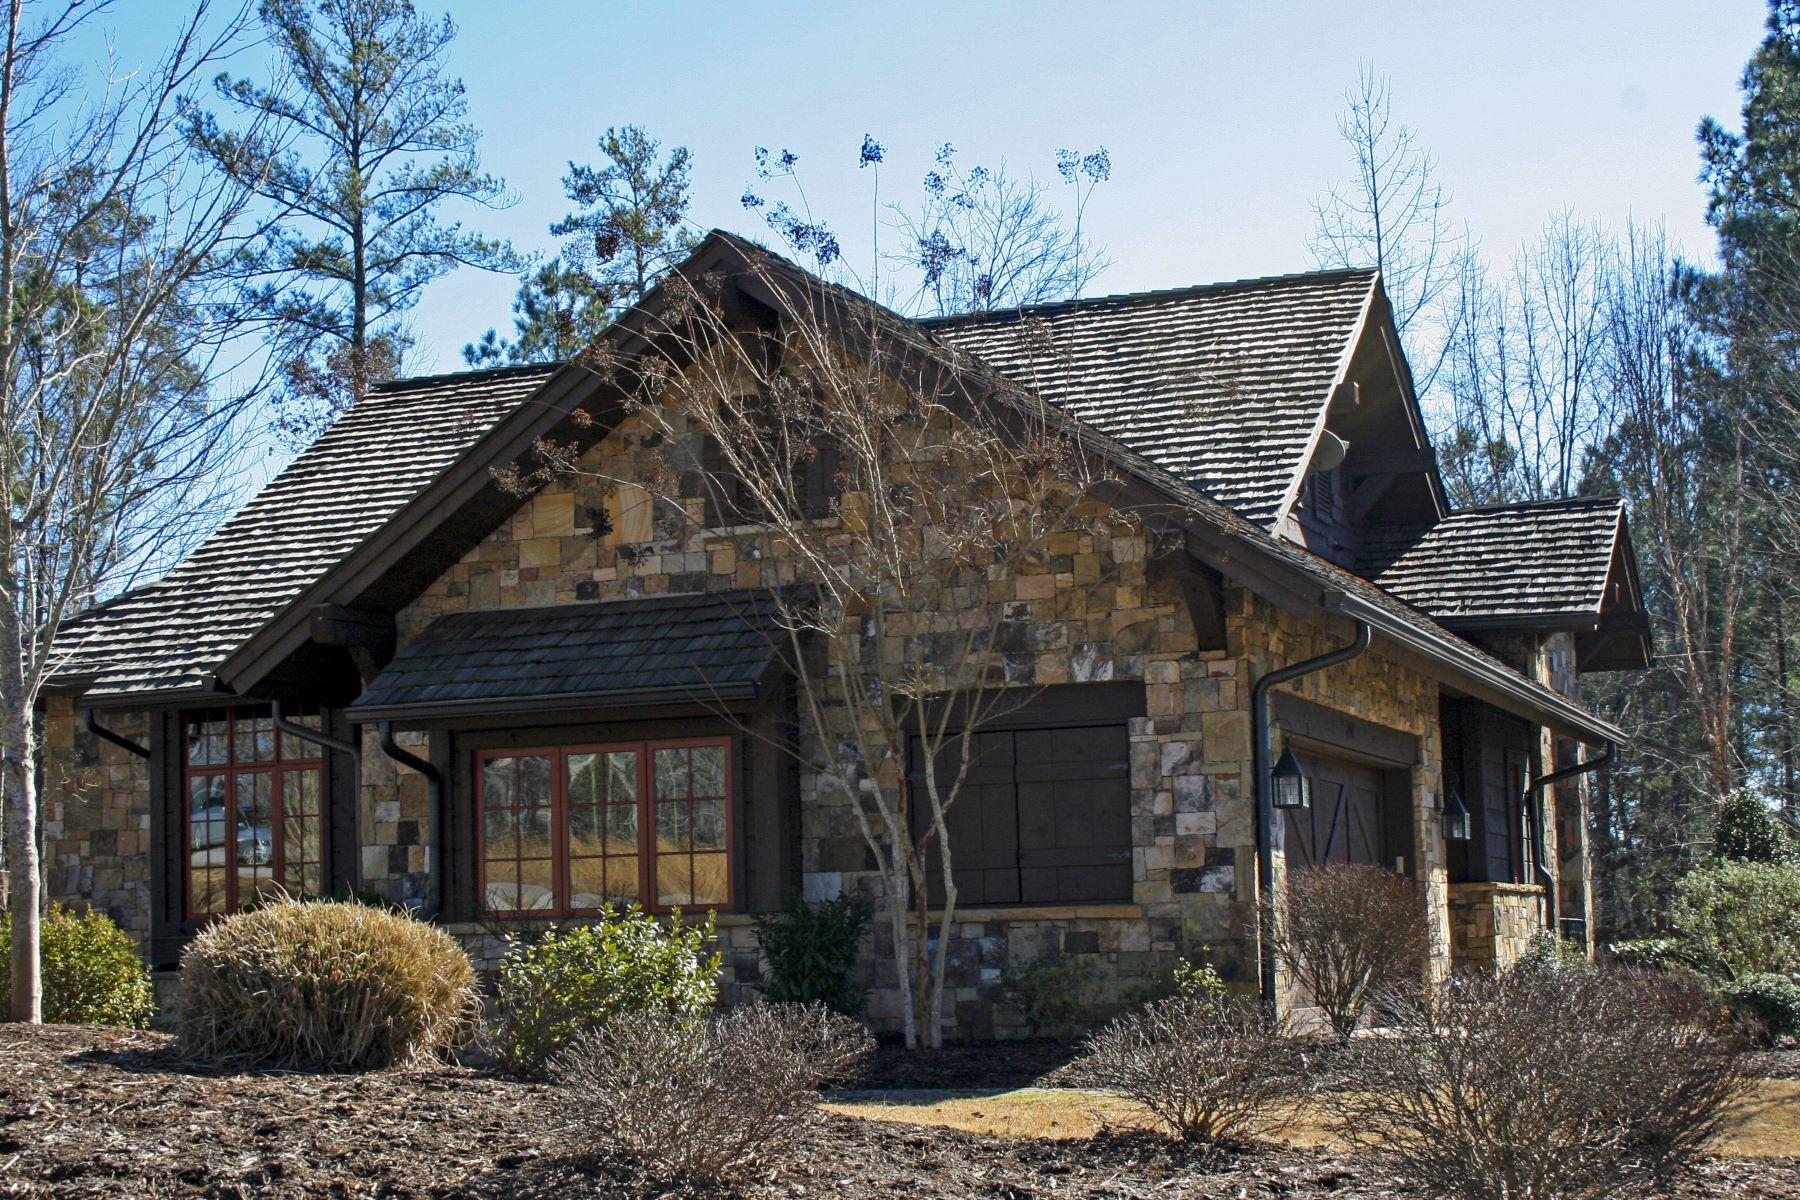 Villa per Vendita alle ore Wonderful Woodland Home with Furnishings Included! 201 Ironwood Court The Cliffs At Keowee Falls, Salem, Carolina Del Sud, 29676 Stati Uniti